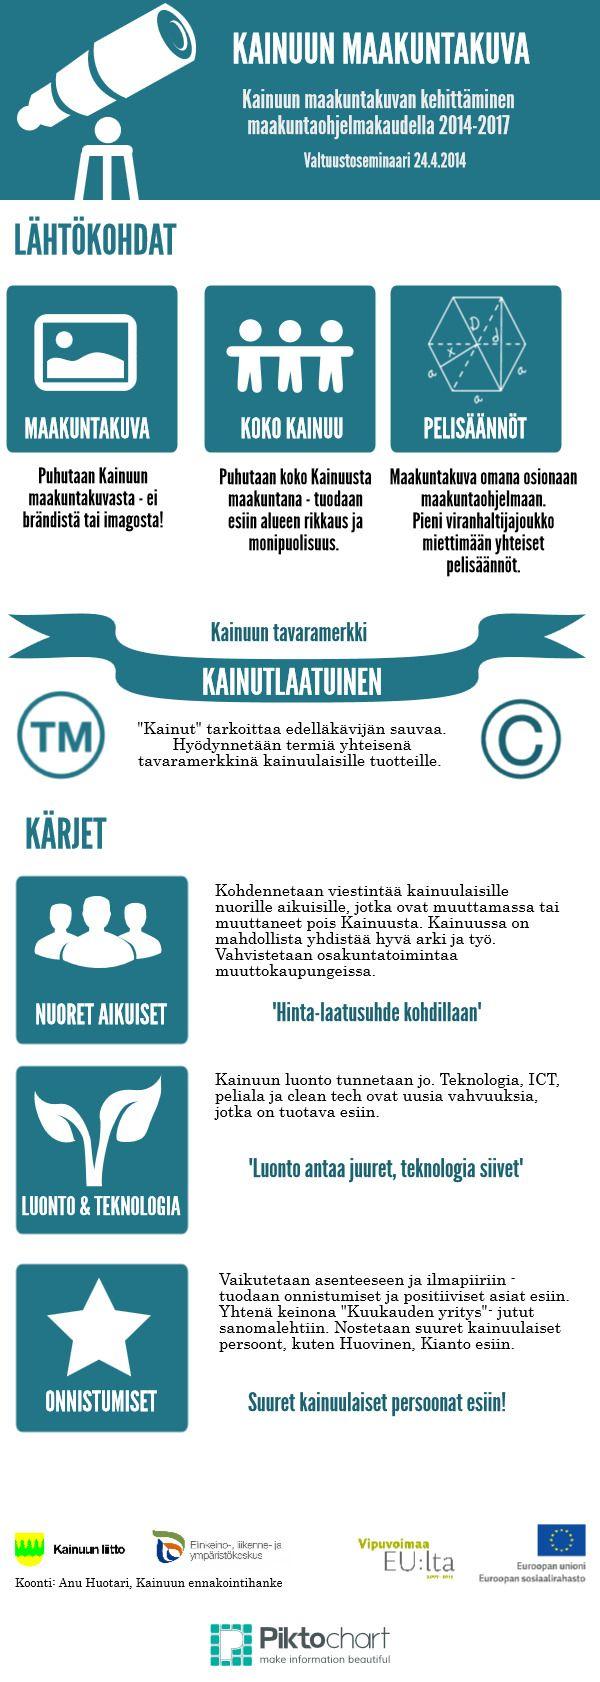 Kainuun maakuntakuva | @Piktochart Infographic